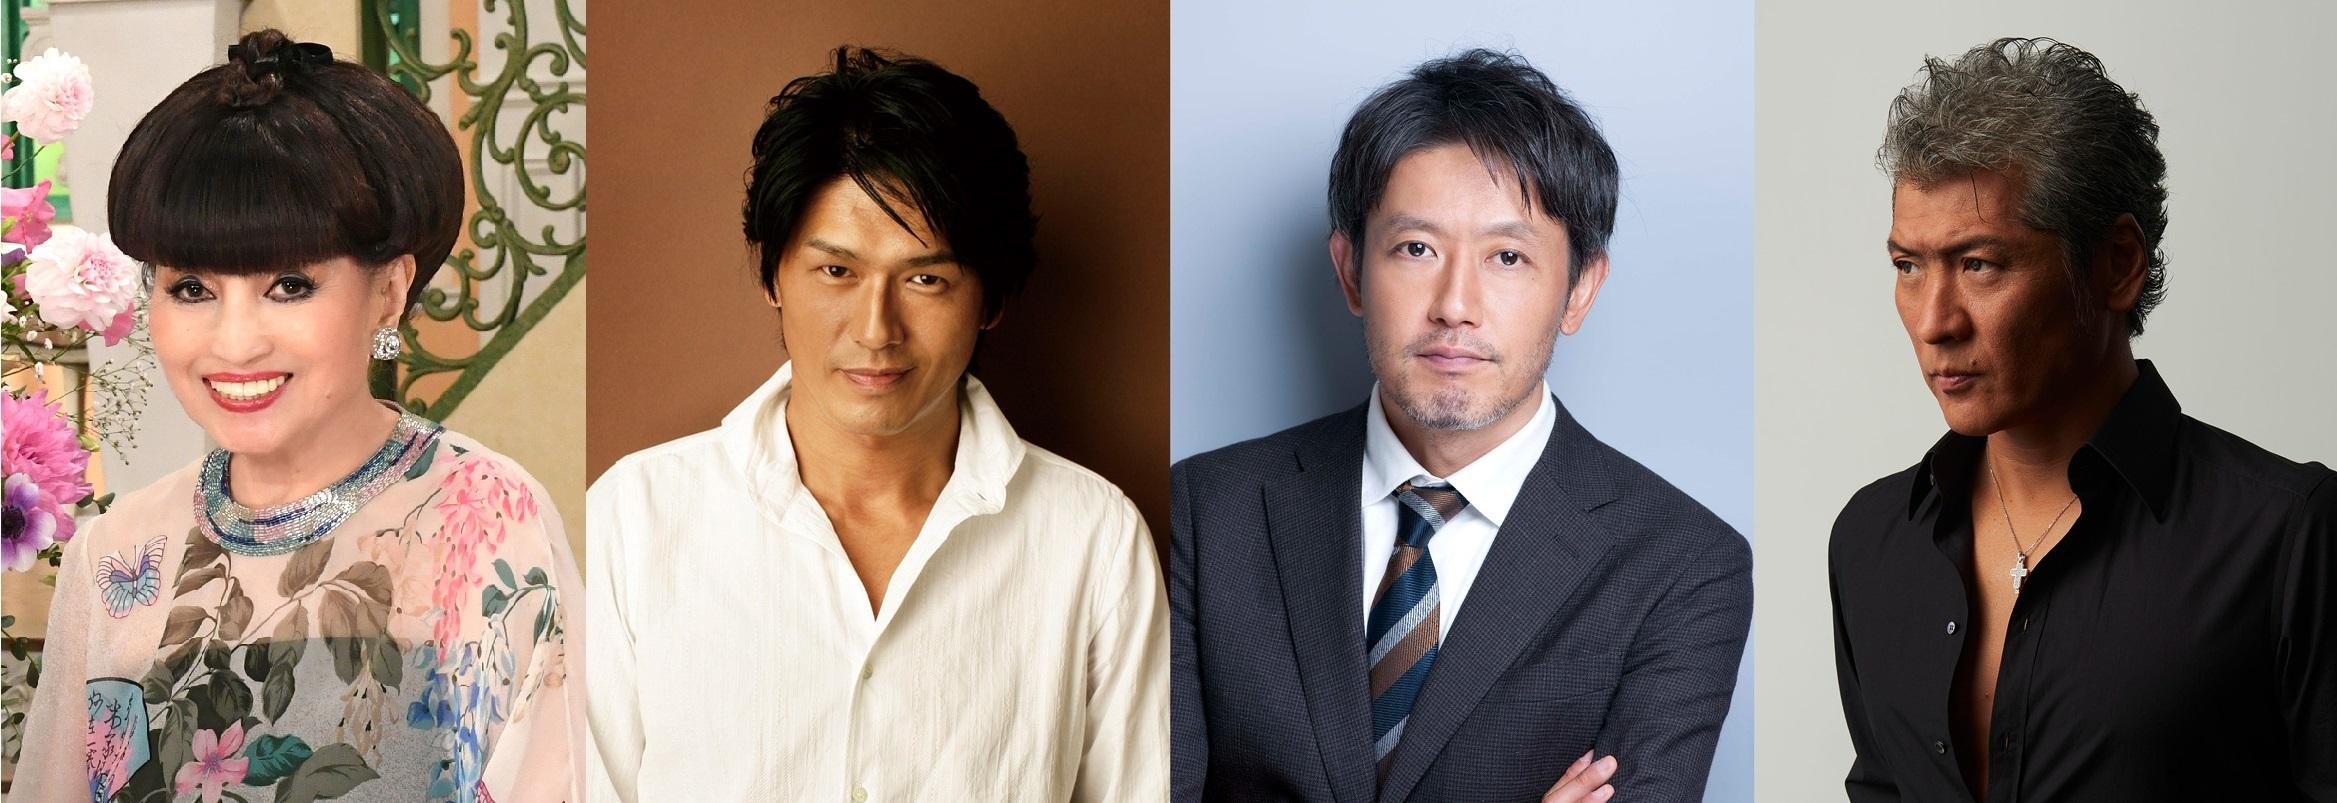 左から 黒柳徹子、高橋克典、筒井道隆、吉川晃司